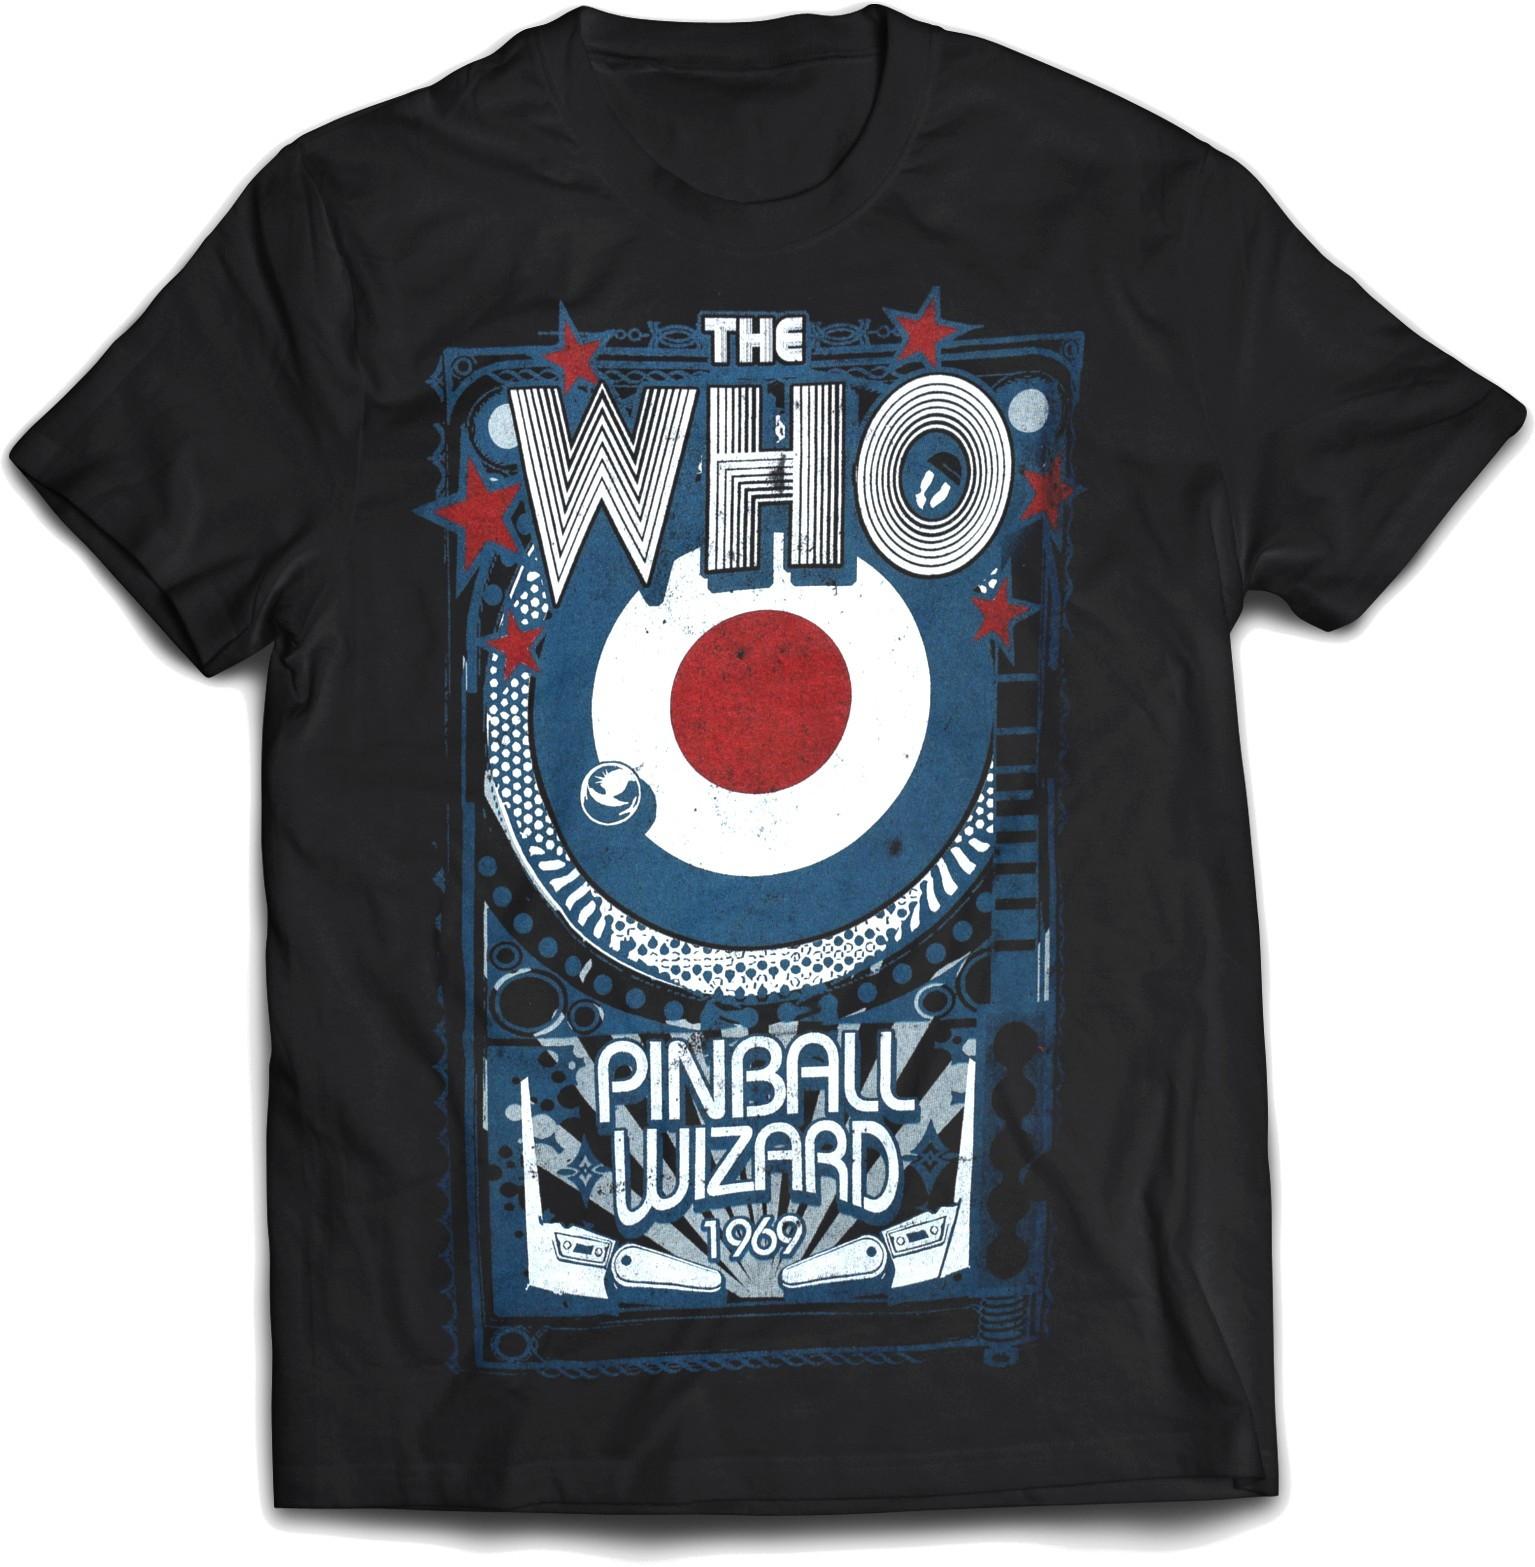 Camiseta de Banda de Rock Feminina Estilizada  760330e7481ab